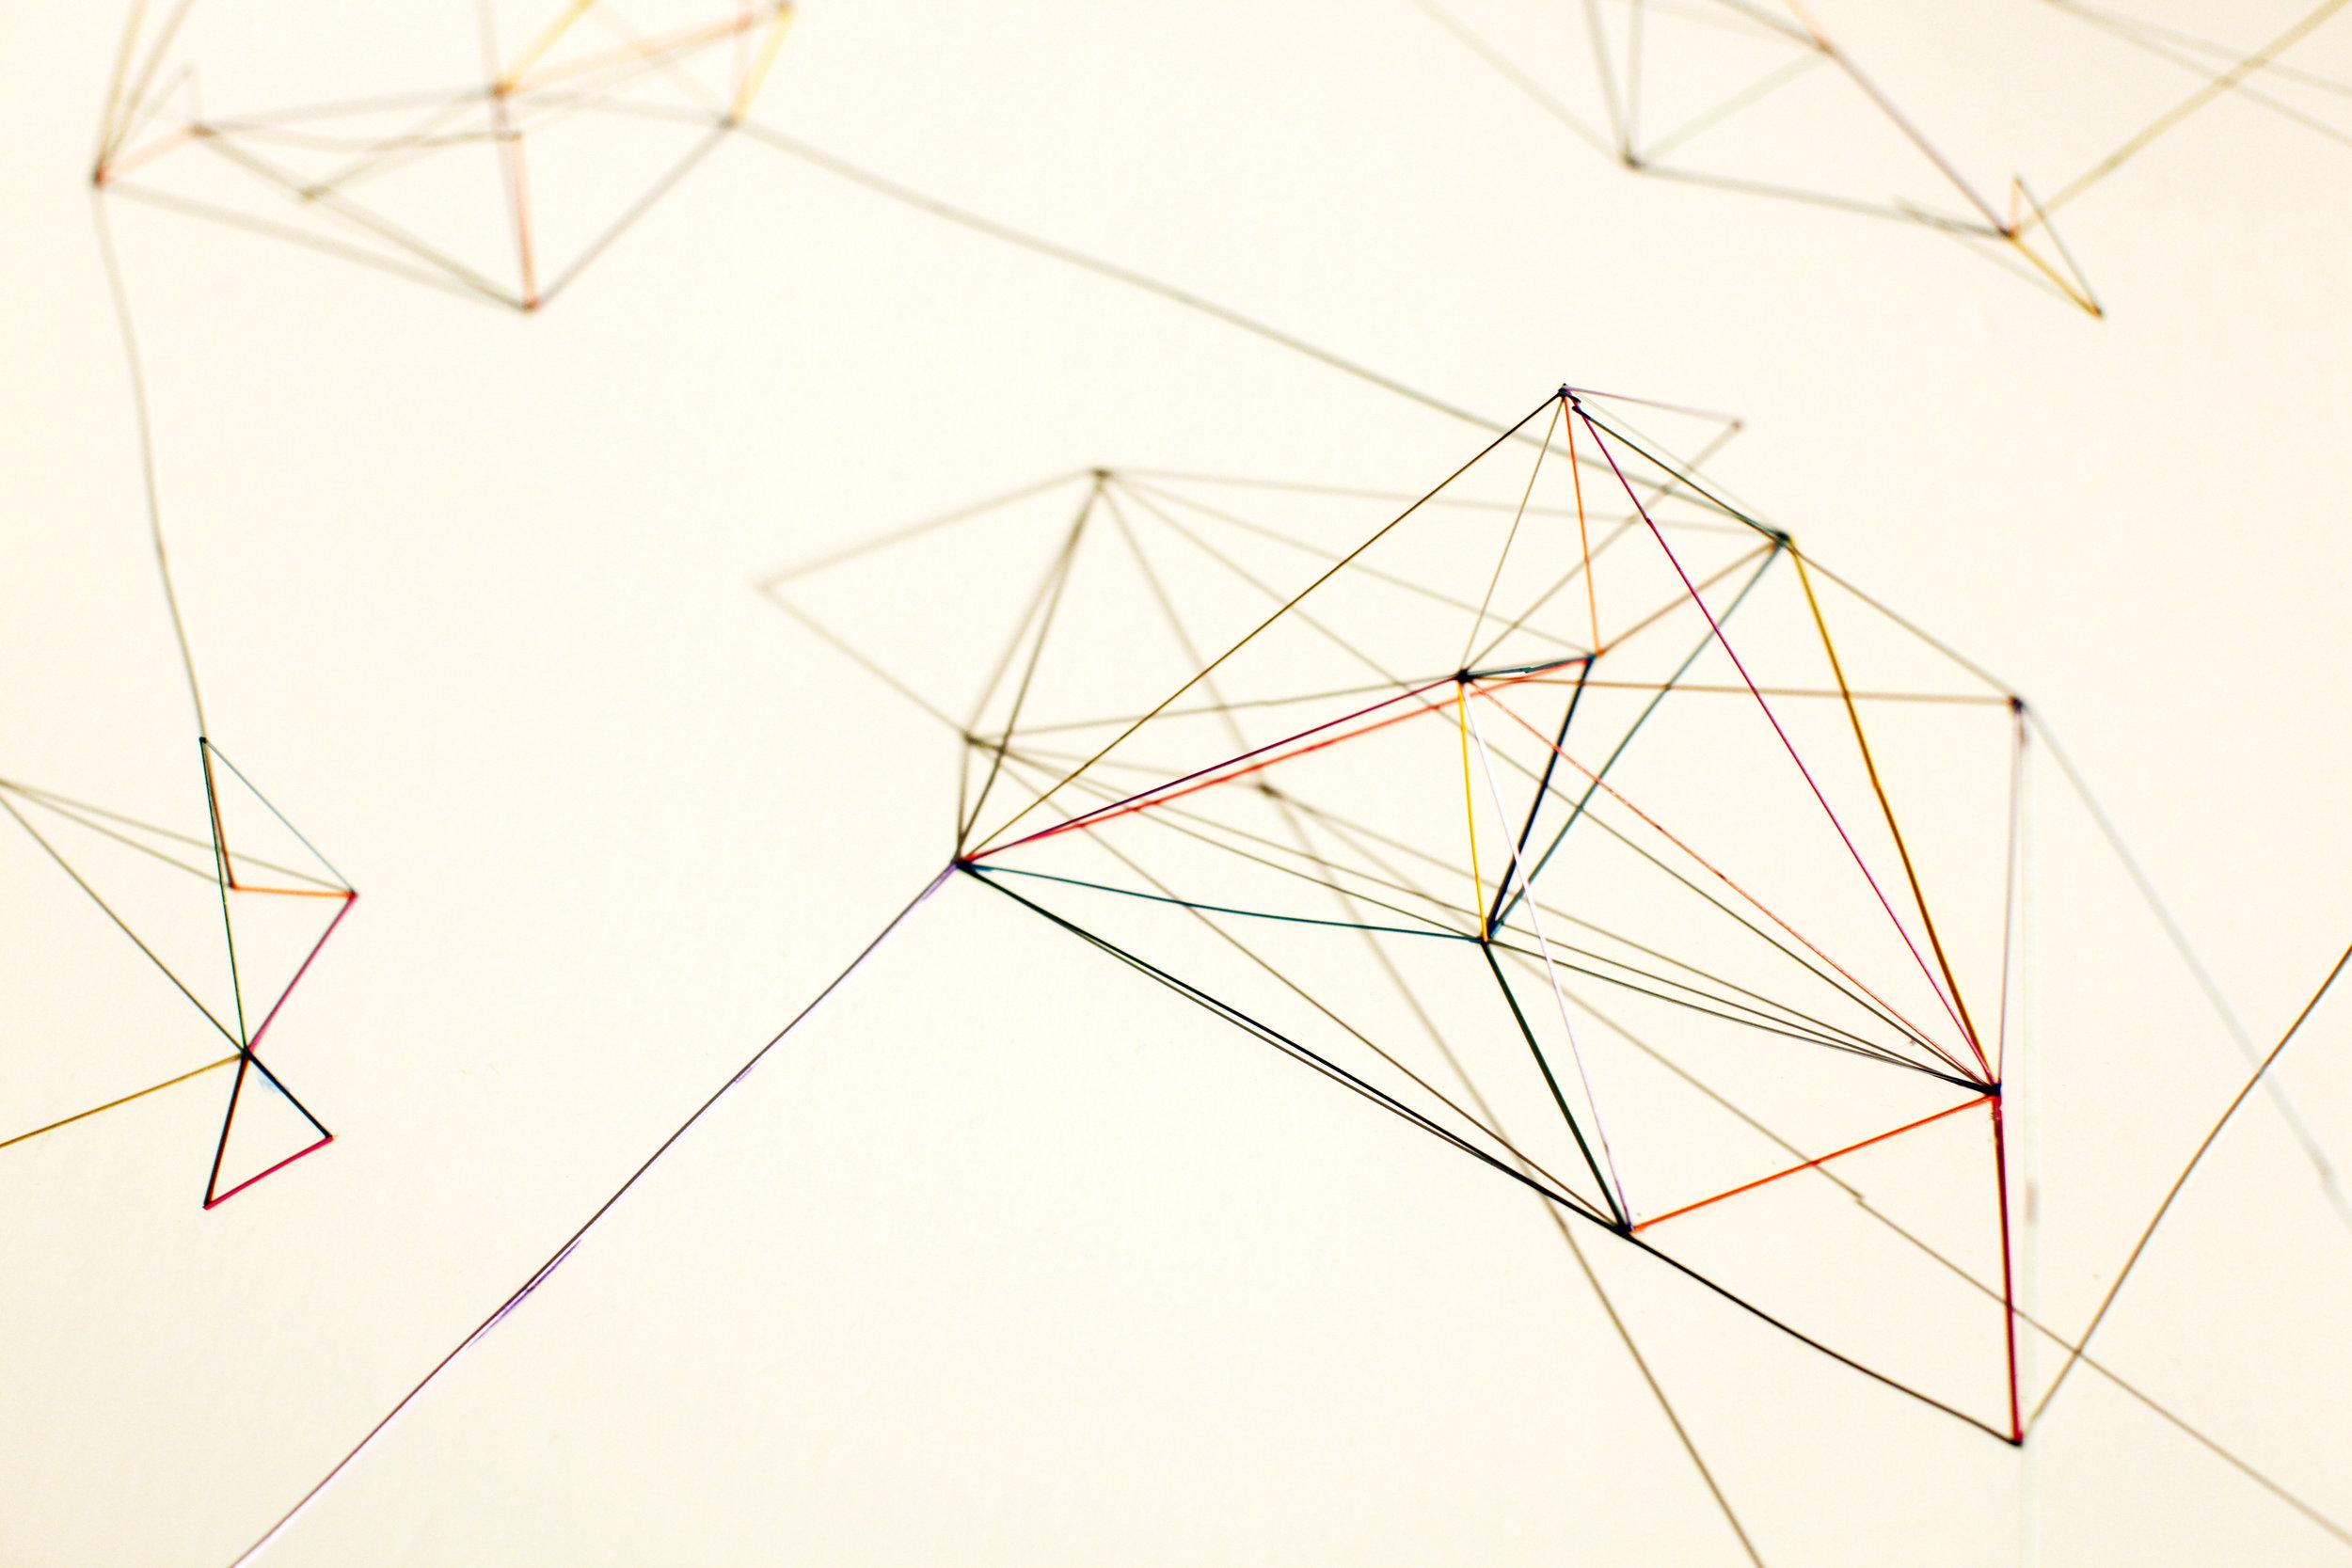 Space Sketch 2 / 2011 / Mechanical pencil lead refill, Graph paper / 54x78x15 cm